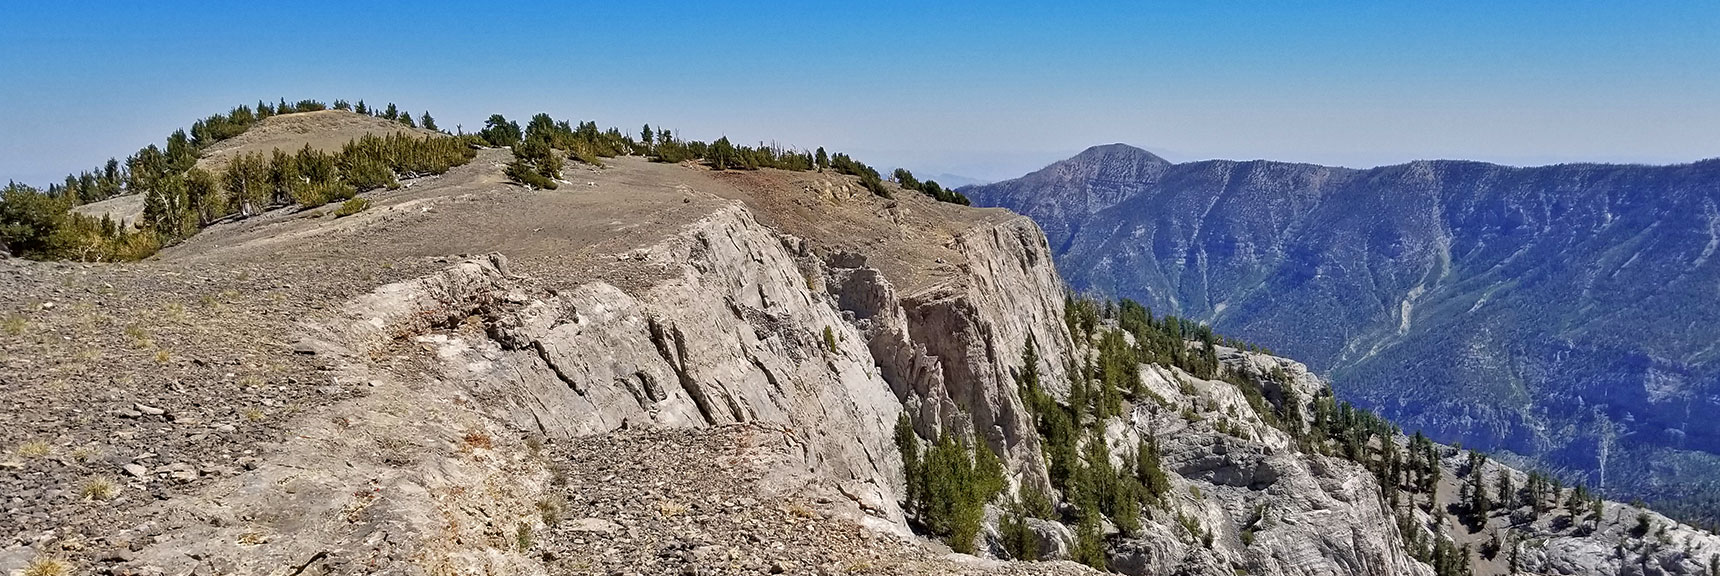 Mummy Mt. Summit, Griffith Peak, South Ridge of Kyle Canyon   Mummy Mountain Adventure with Glenn & Shoshi Hall, Spring Mountains Wilderness, Nevada 011